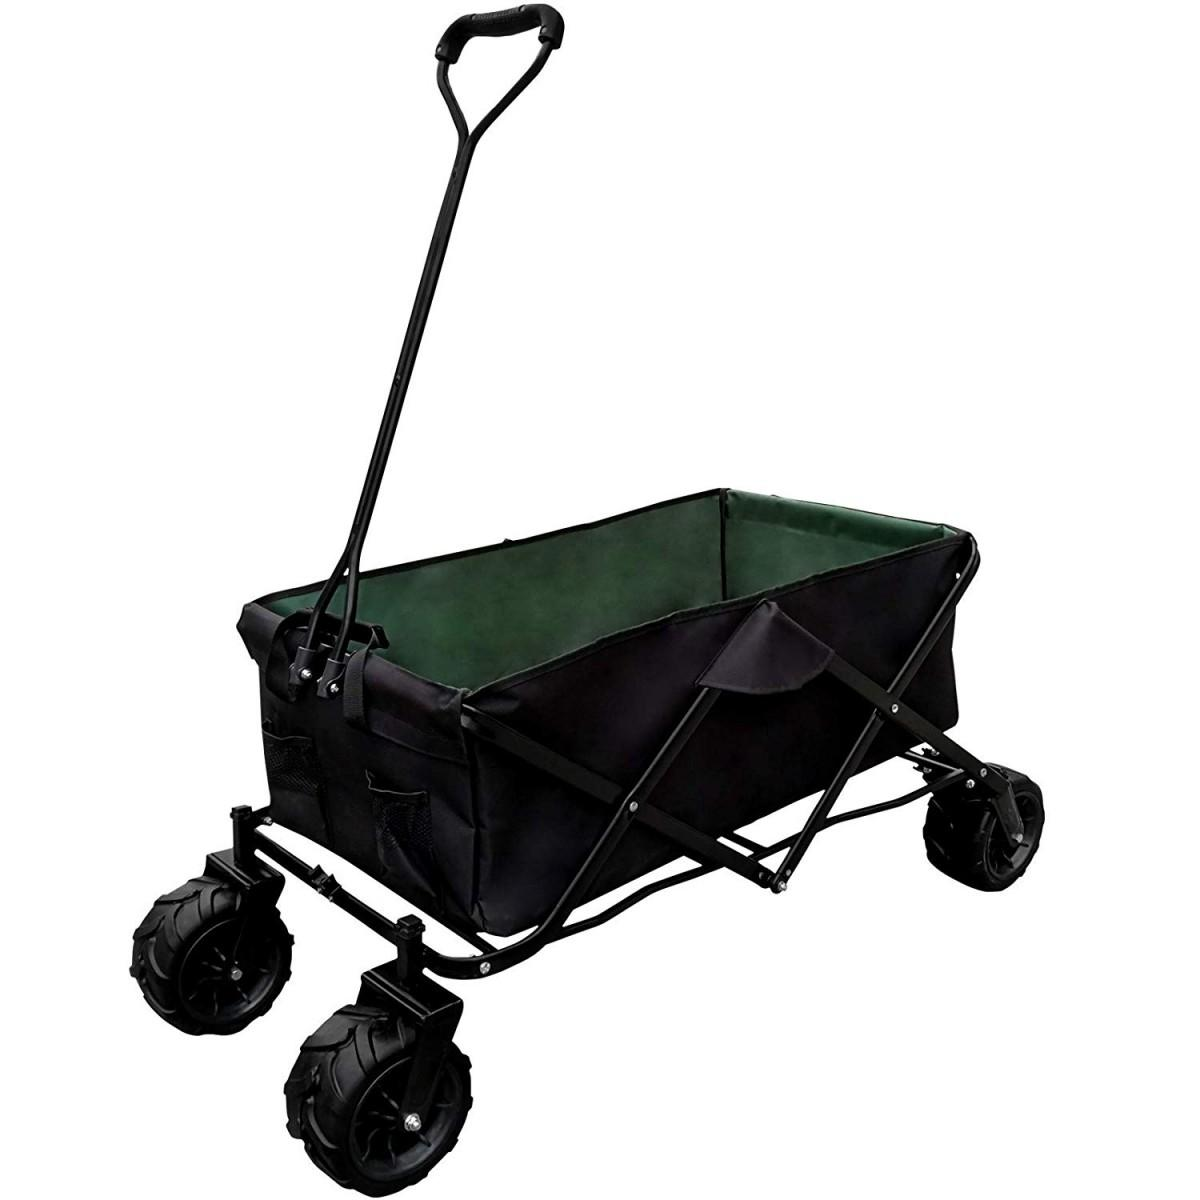 Handcart Foldable 4 Wheels Max. 80 kg, 117 x 54 x 109 cm, choice of colours, hand trolley, garden trailer, transport trolley, beach trolley